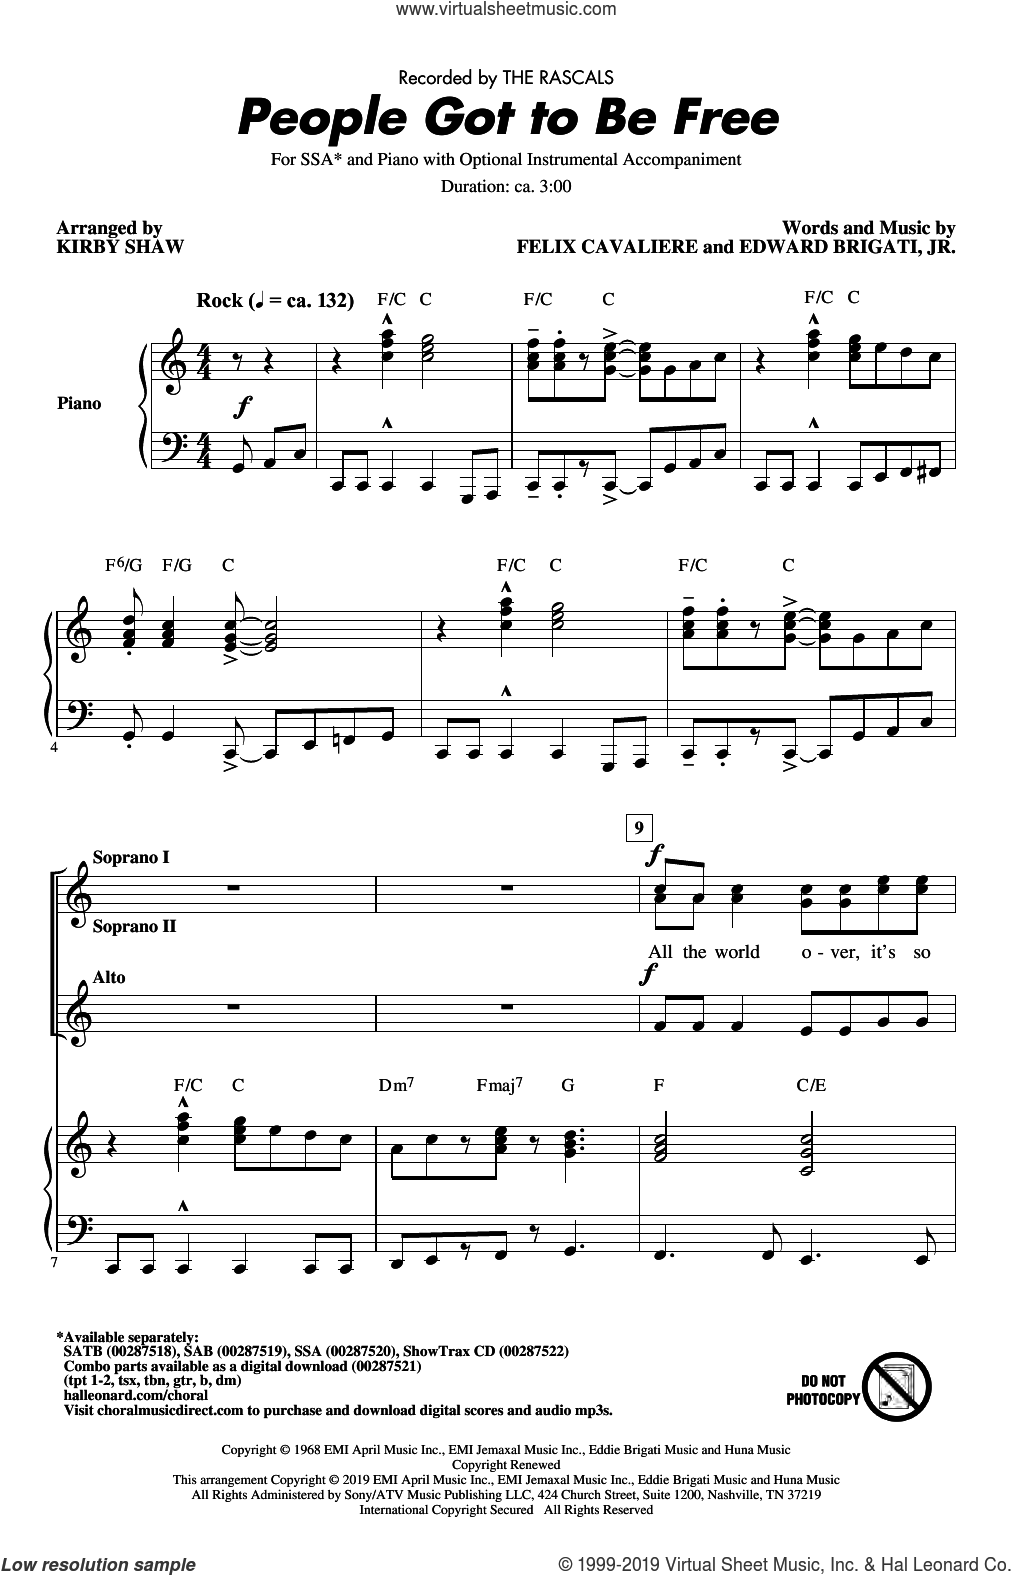 People Got To Be Free (arr. Kirby Shaw) sheet music for choir (SSA: soprano, alto) by The Rascals, Kirby Shaw, Edward Brigati Jr. and Felix Cavaliere, intermediate skill level